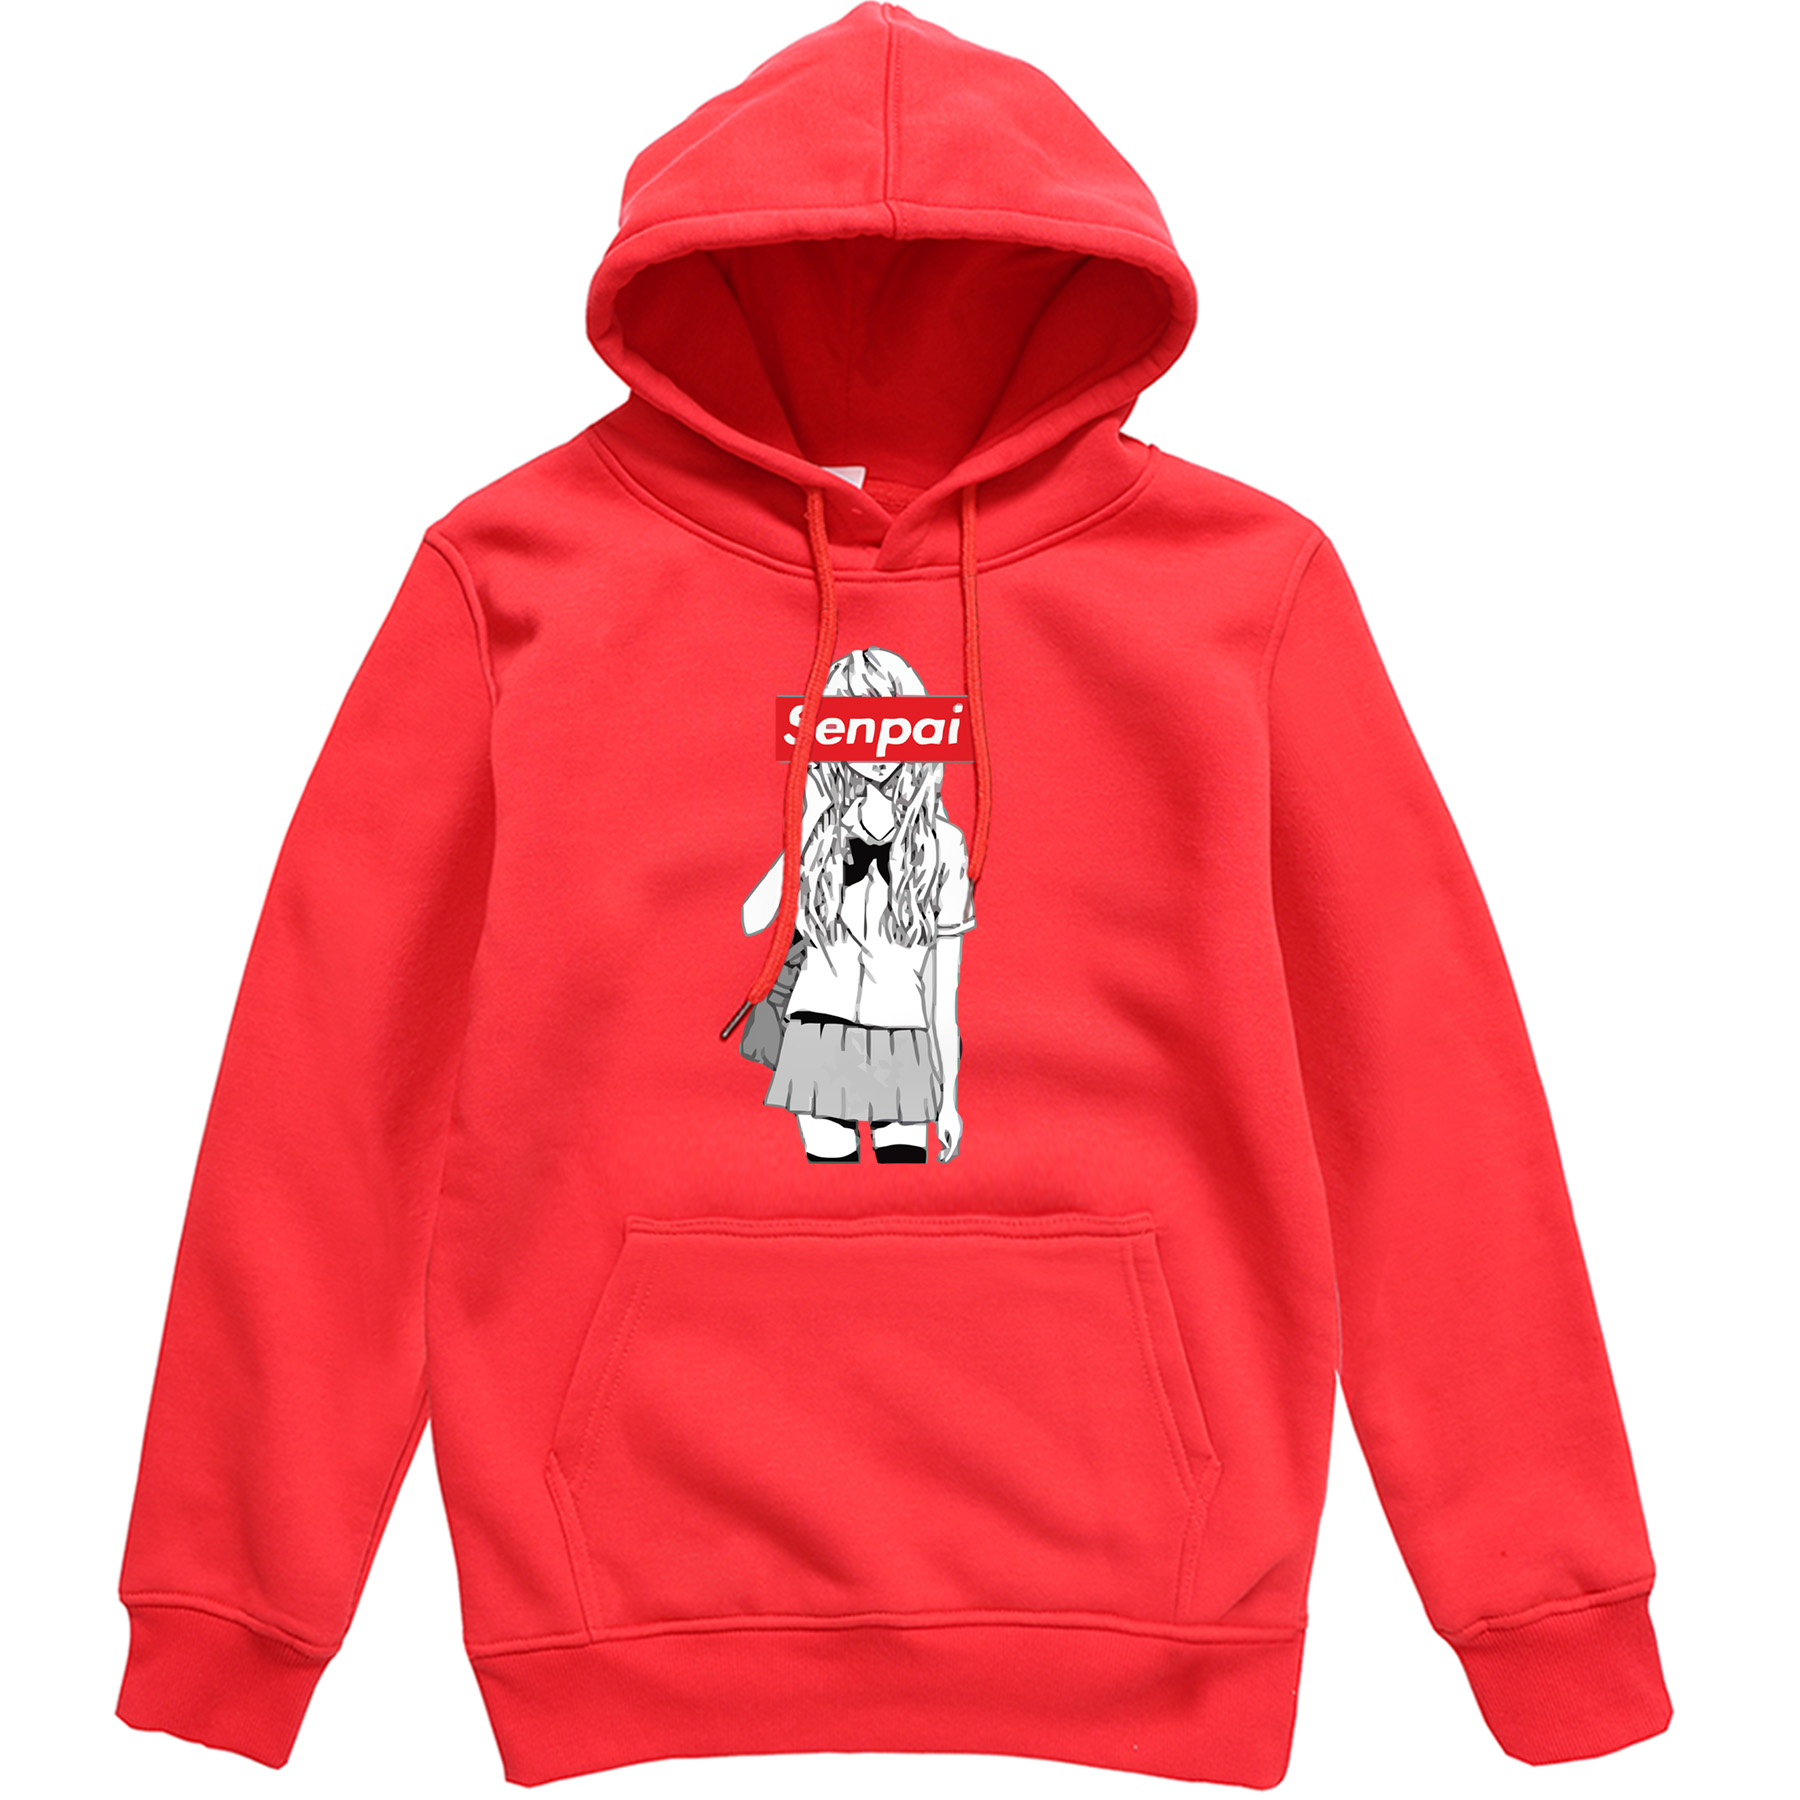 Men Streetwear Hoodies Senpai Anime Girl Mens Brand Pullover 2019 Hot Hoodie Personality Tracksuit Male Hip Hop Outdoor Tops Men